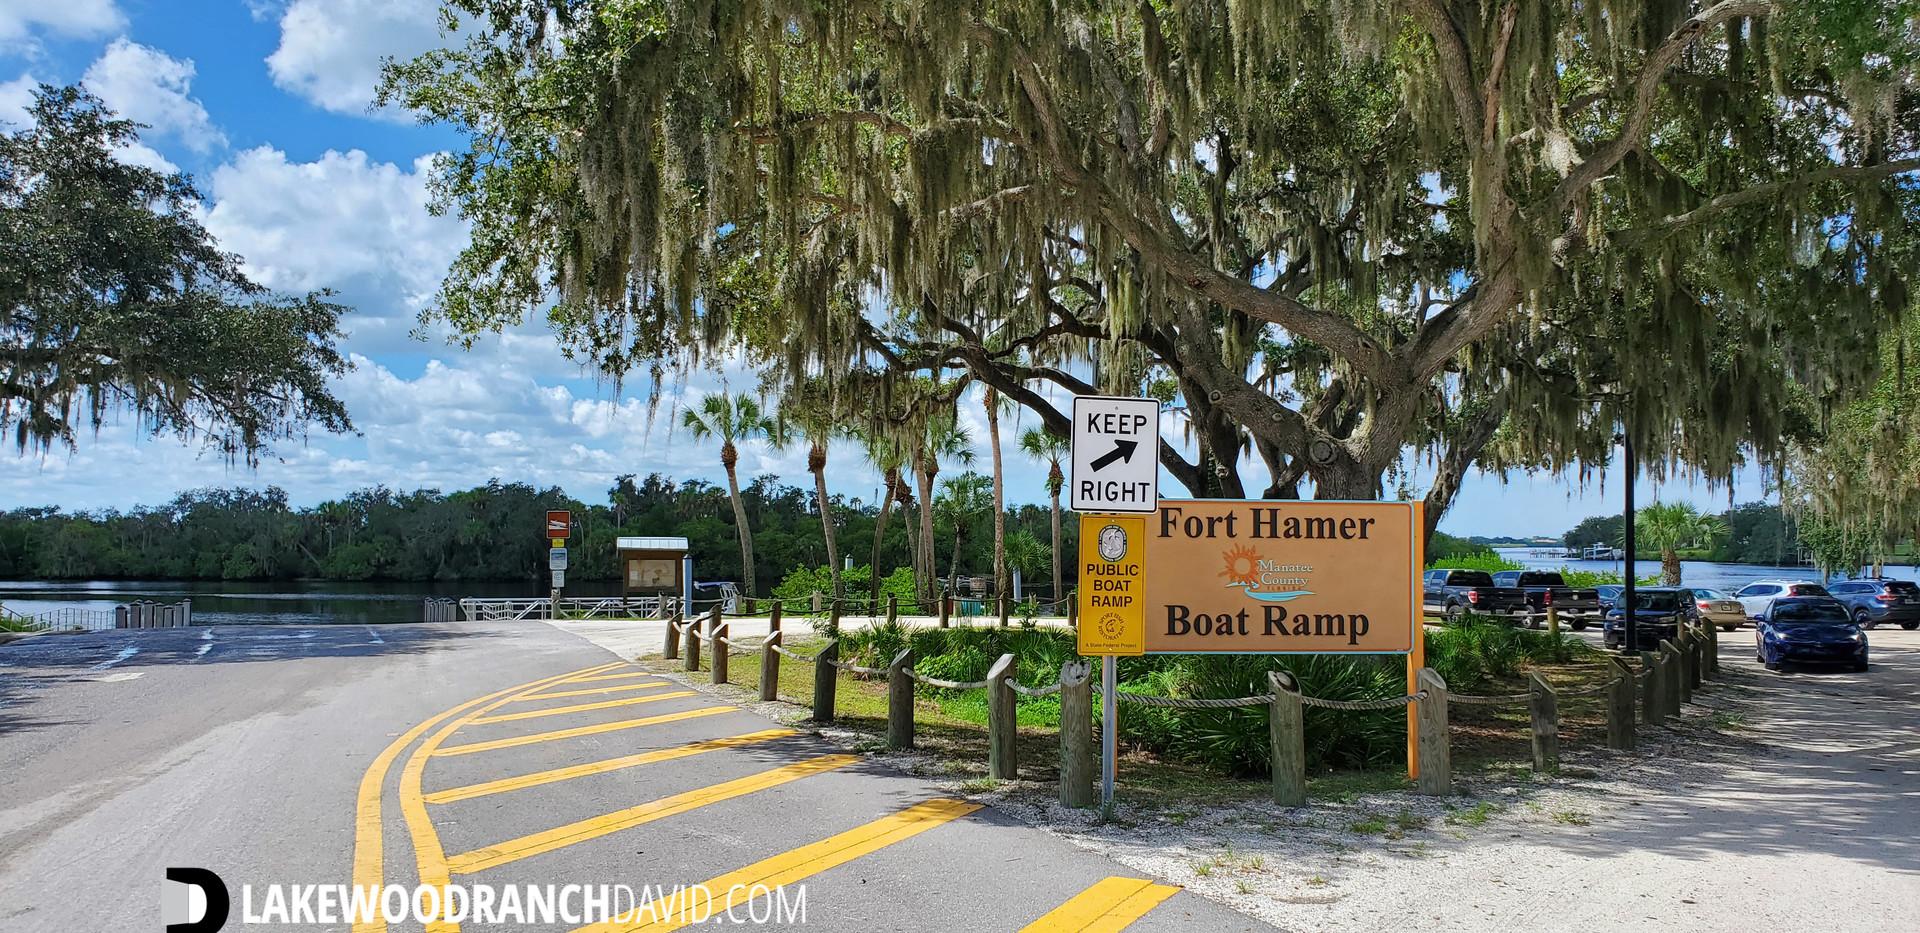 Fort Hamer Boat Ramp in Parrish FL